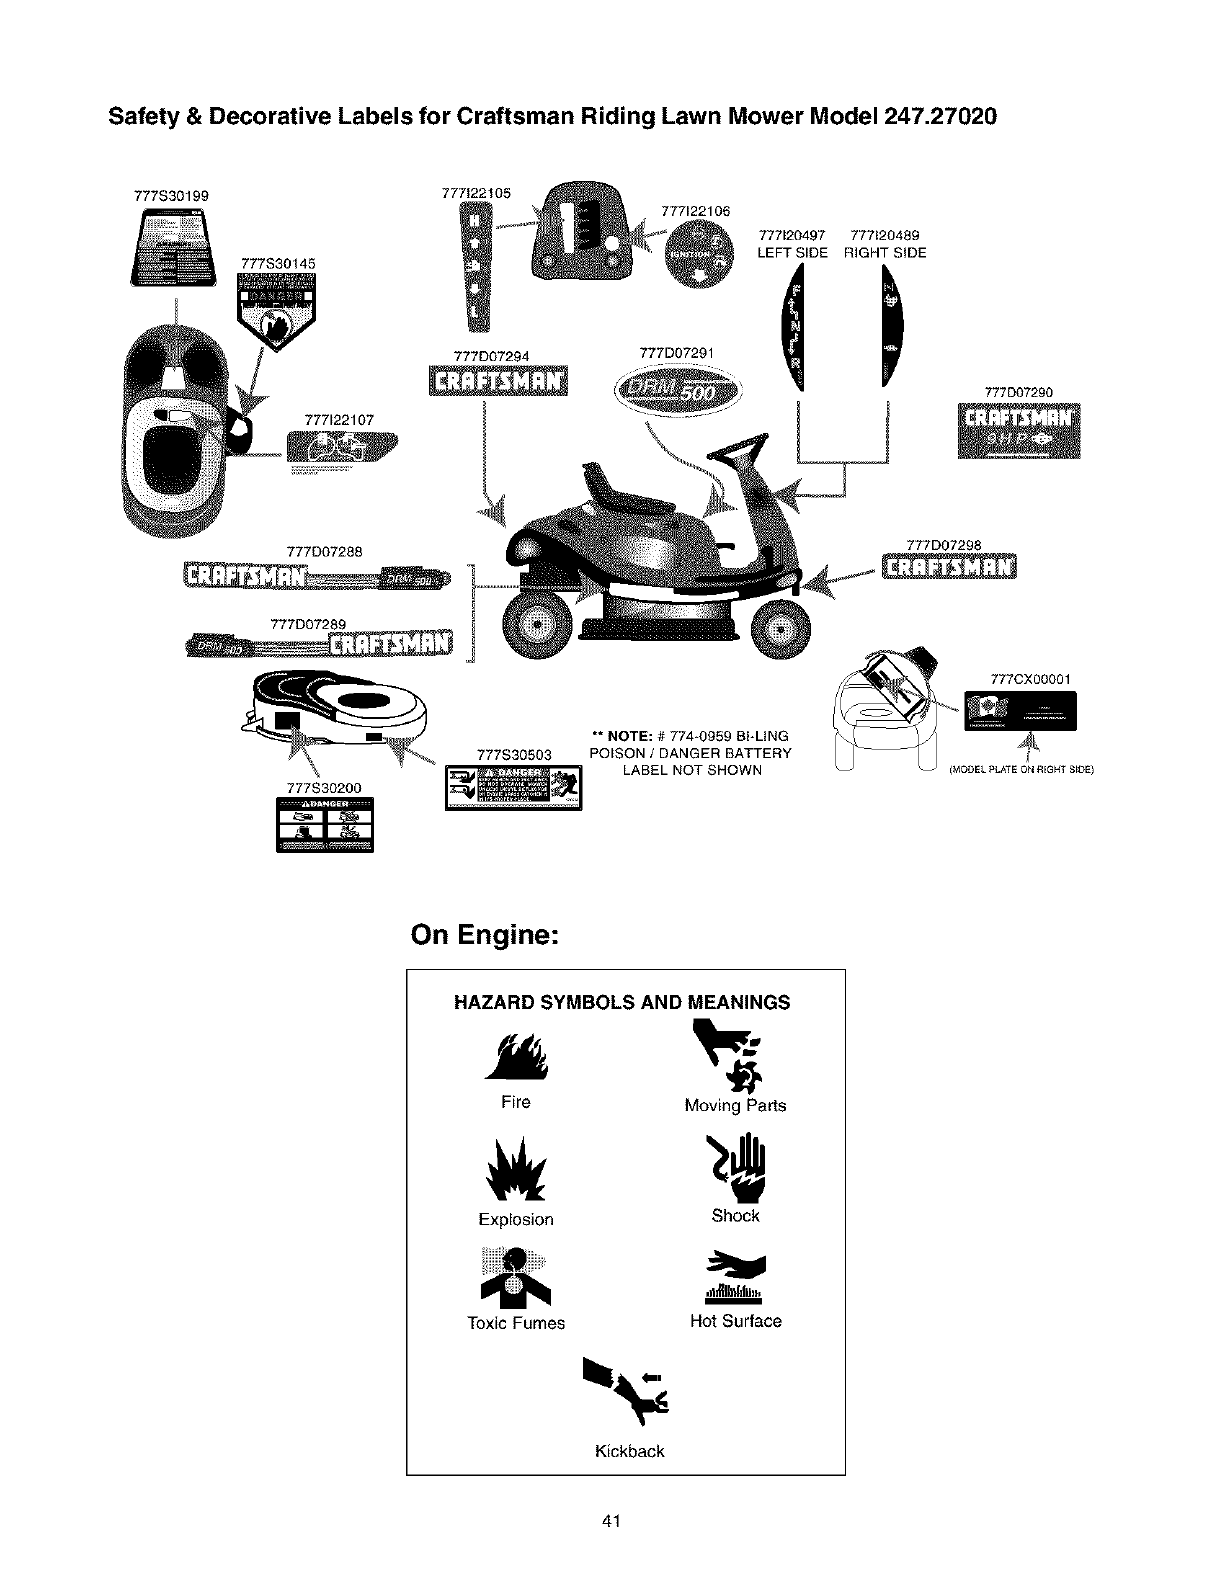 Craftsman 247270200 User Manual RIDING MOWER Manuals And